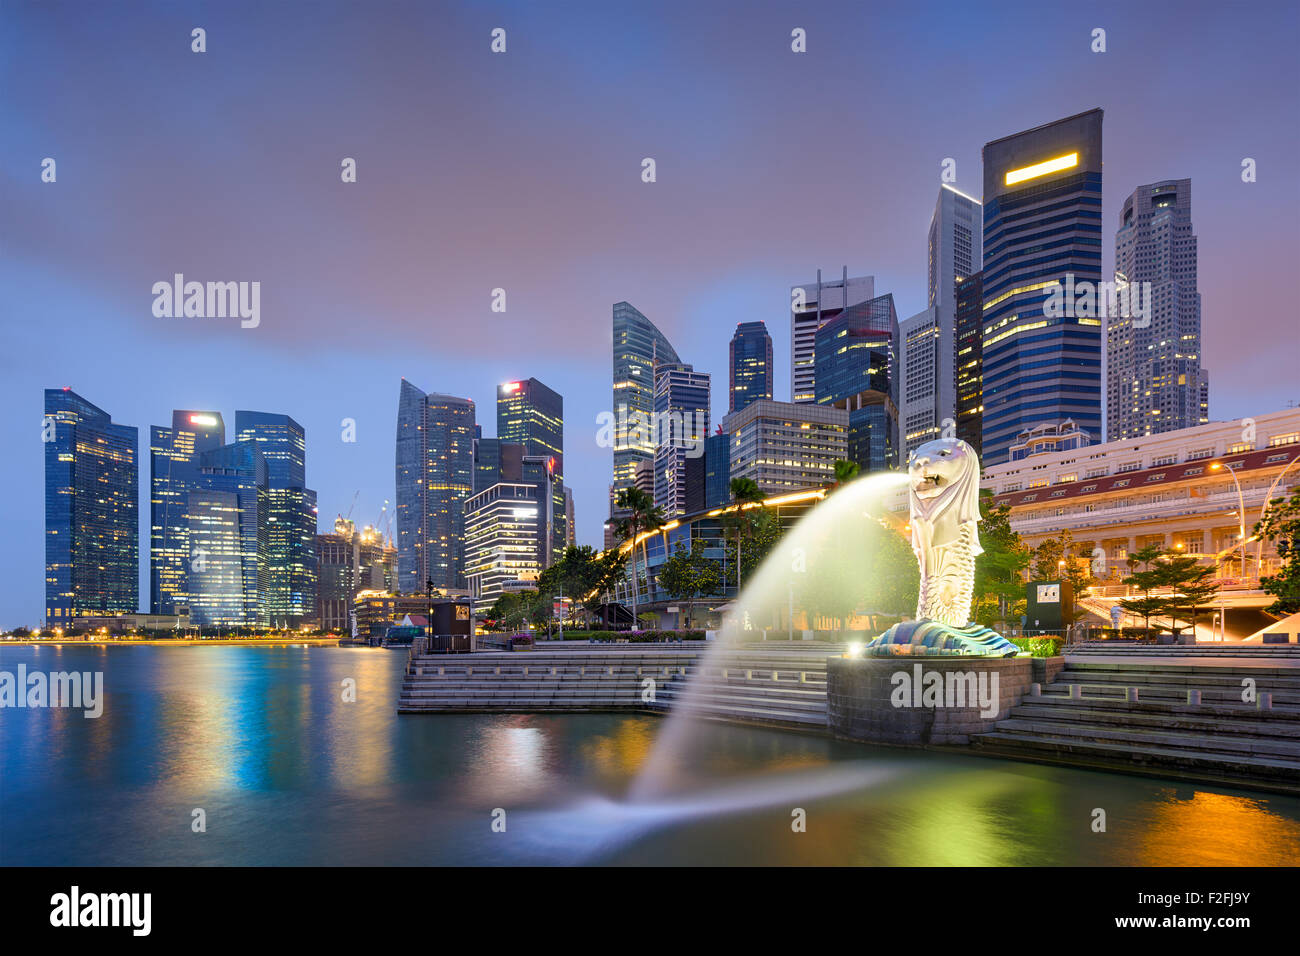 Singapore skyline at the fountain. - Stock Image